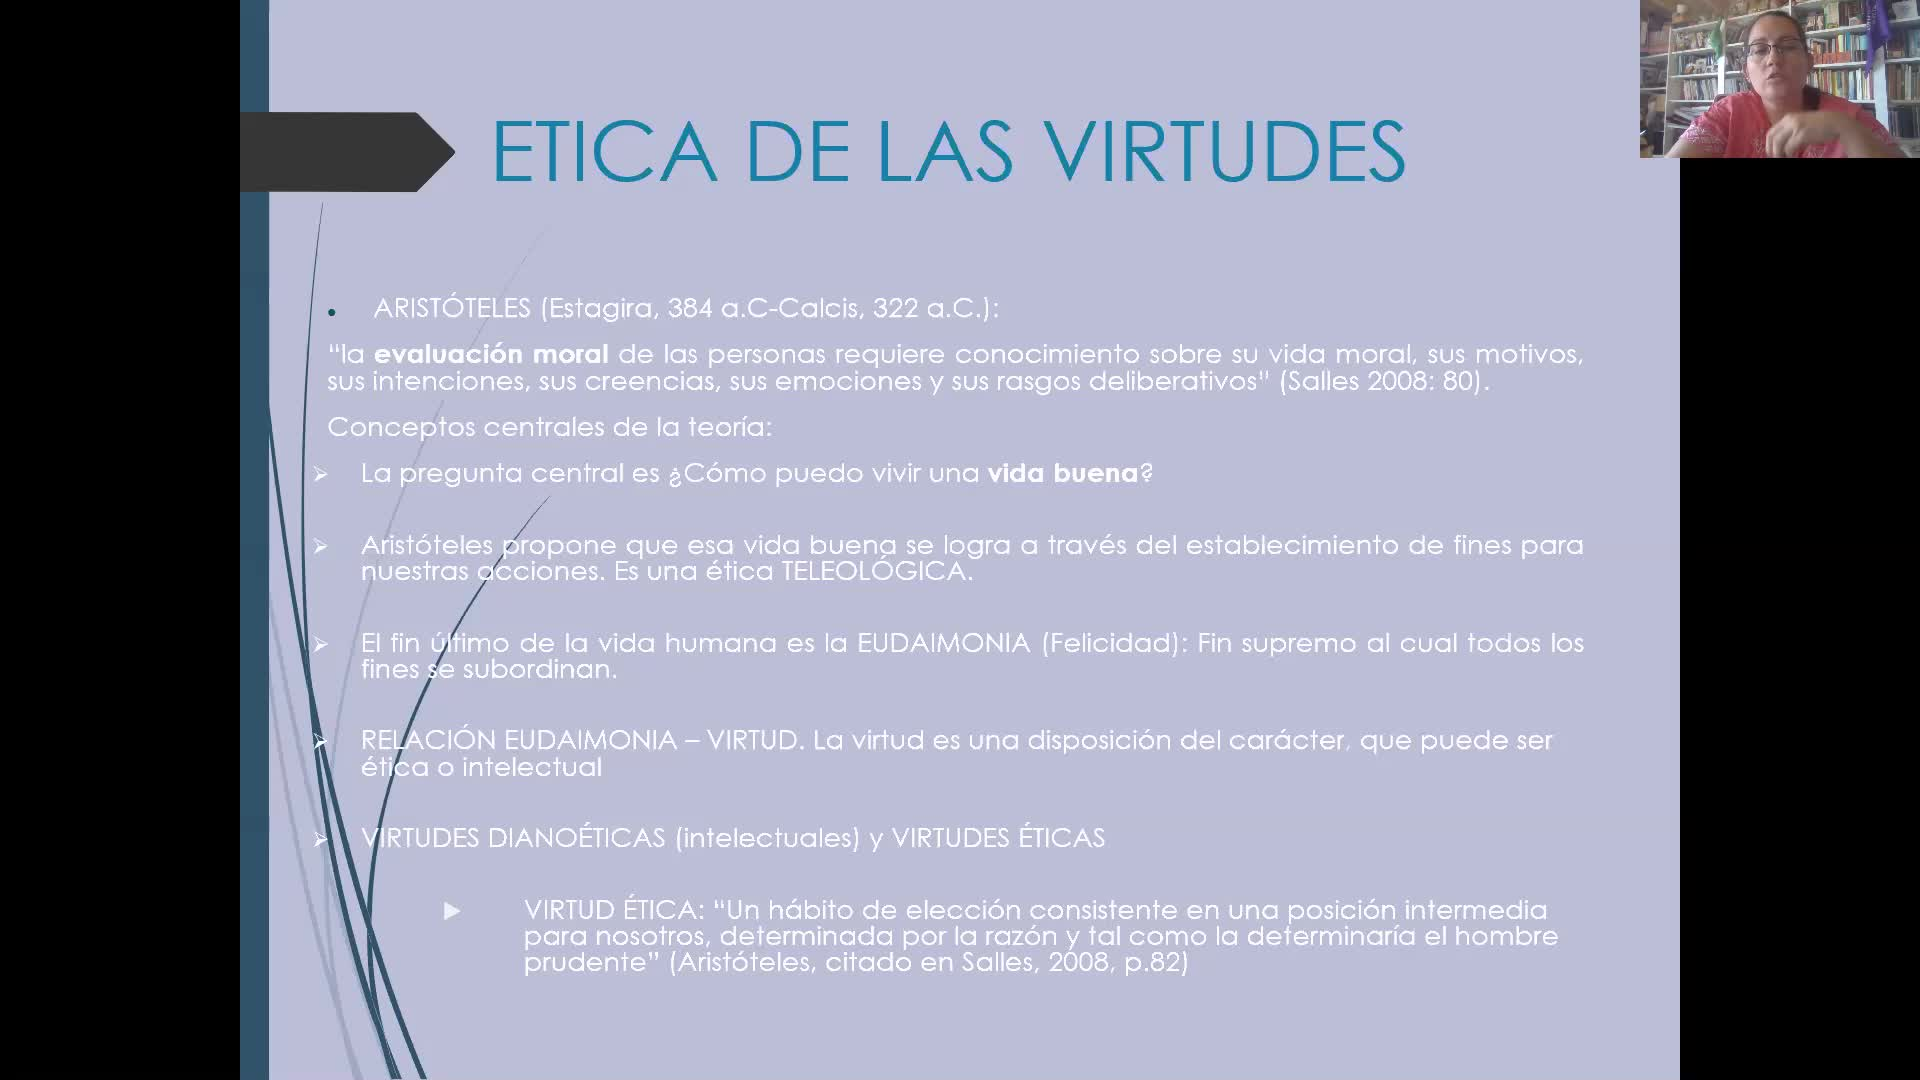 Teorías éticas clásicas-1 de 3-Ética de las virtudes